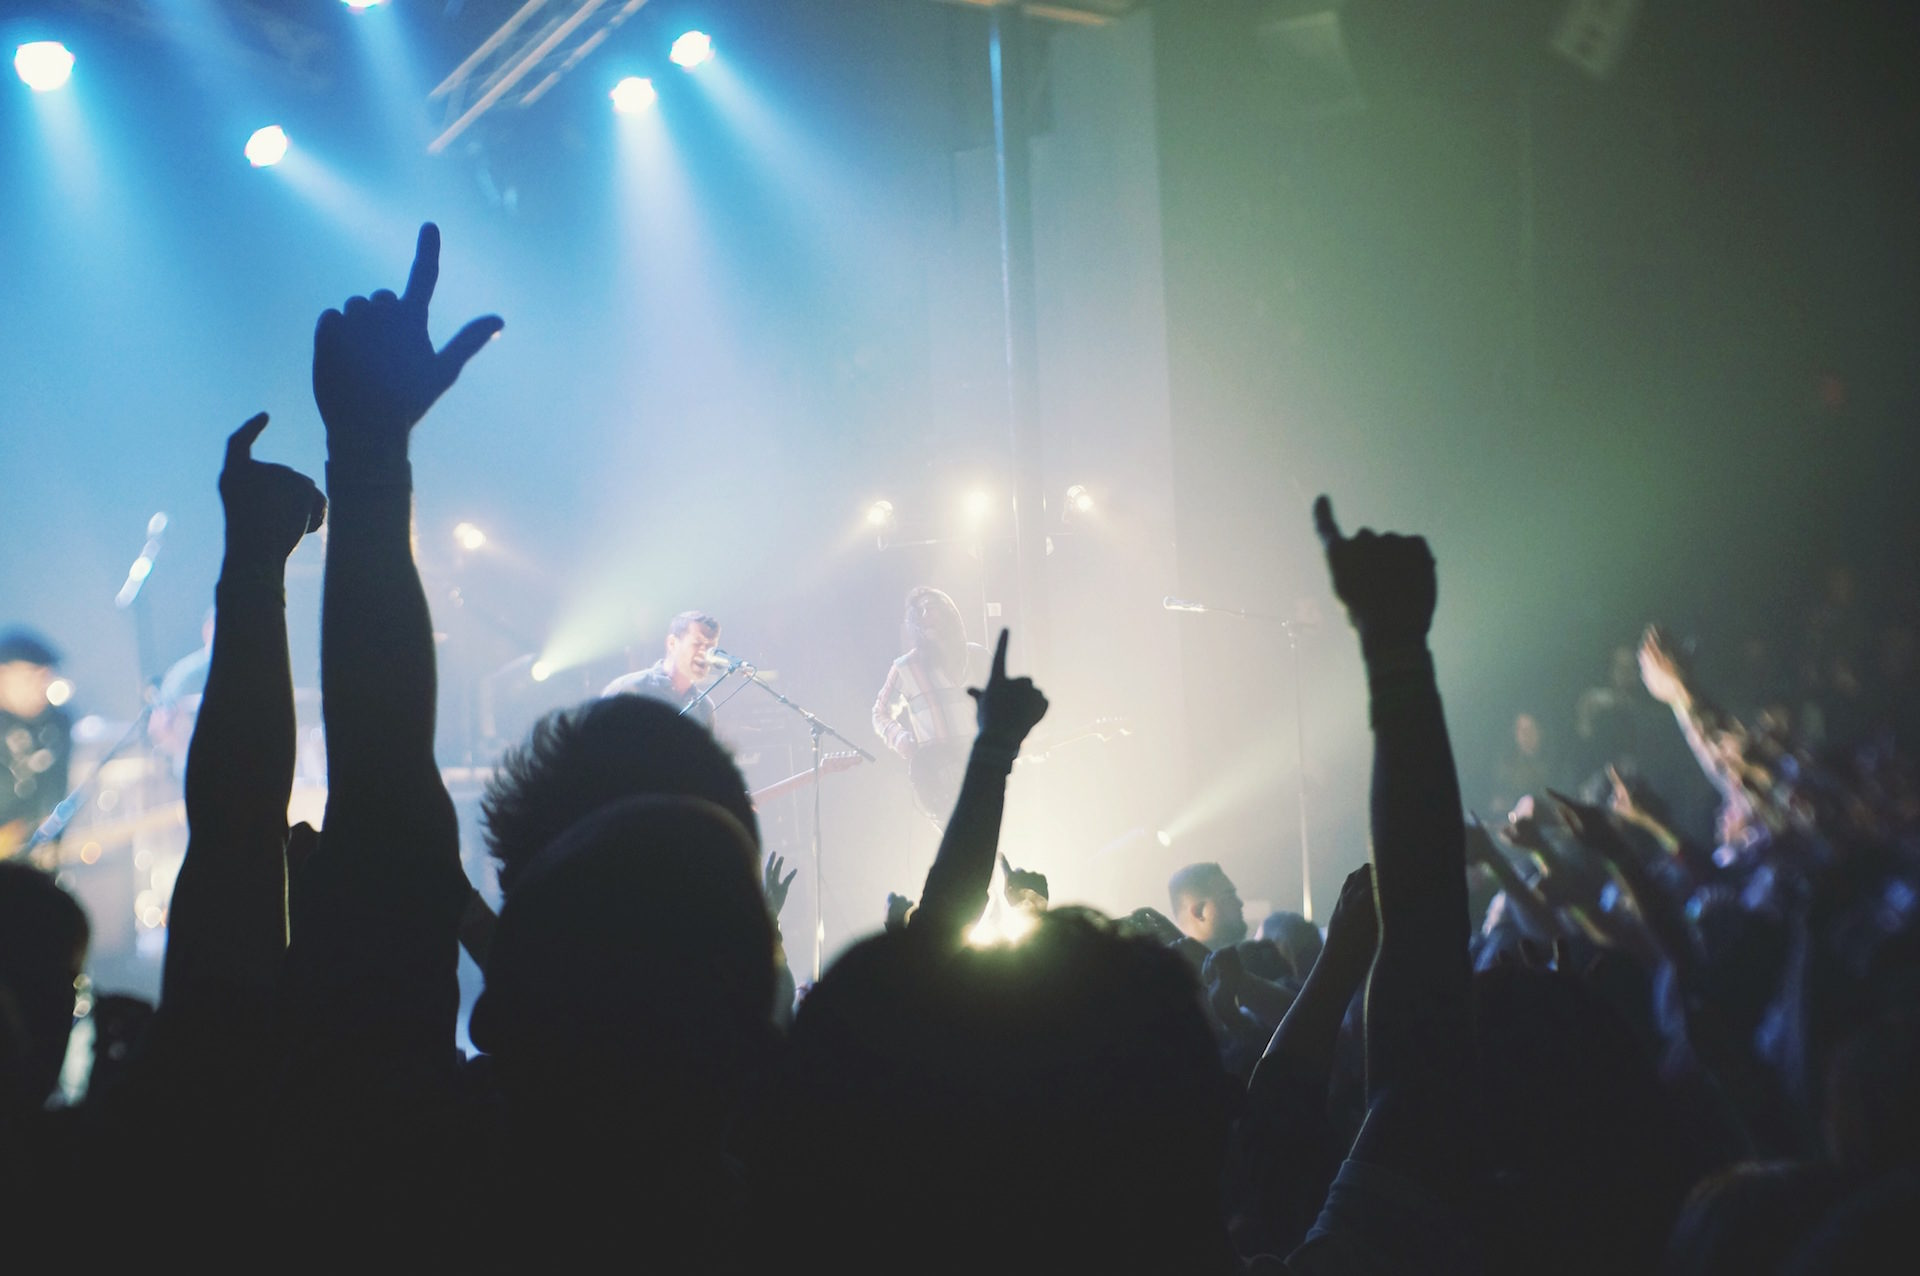 concert, amusement, main, chanteur, danse - Fonds d'écran HD - Professor-falken.com